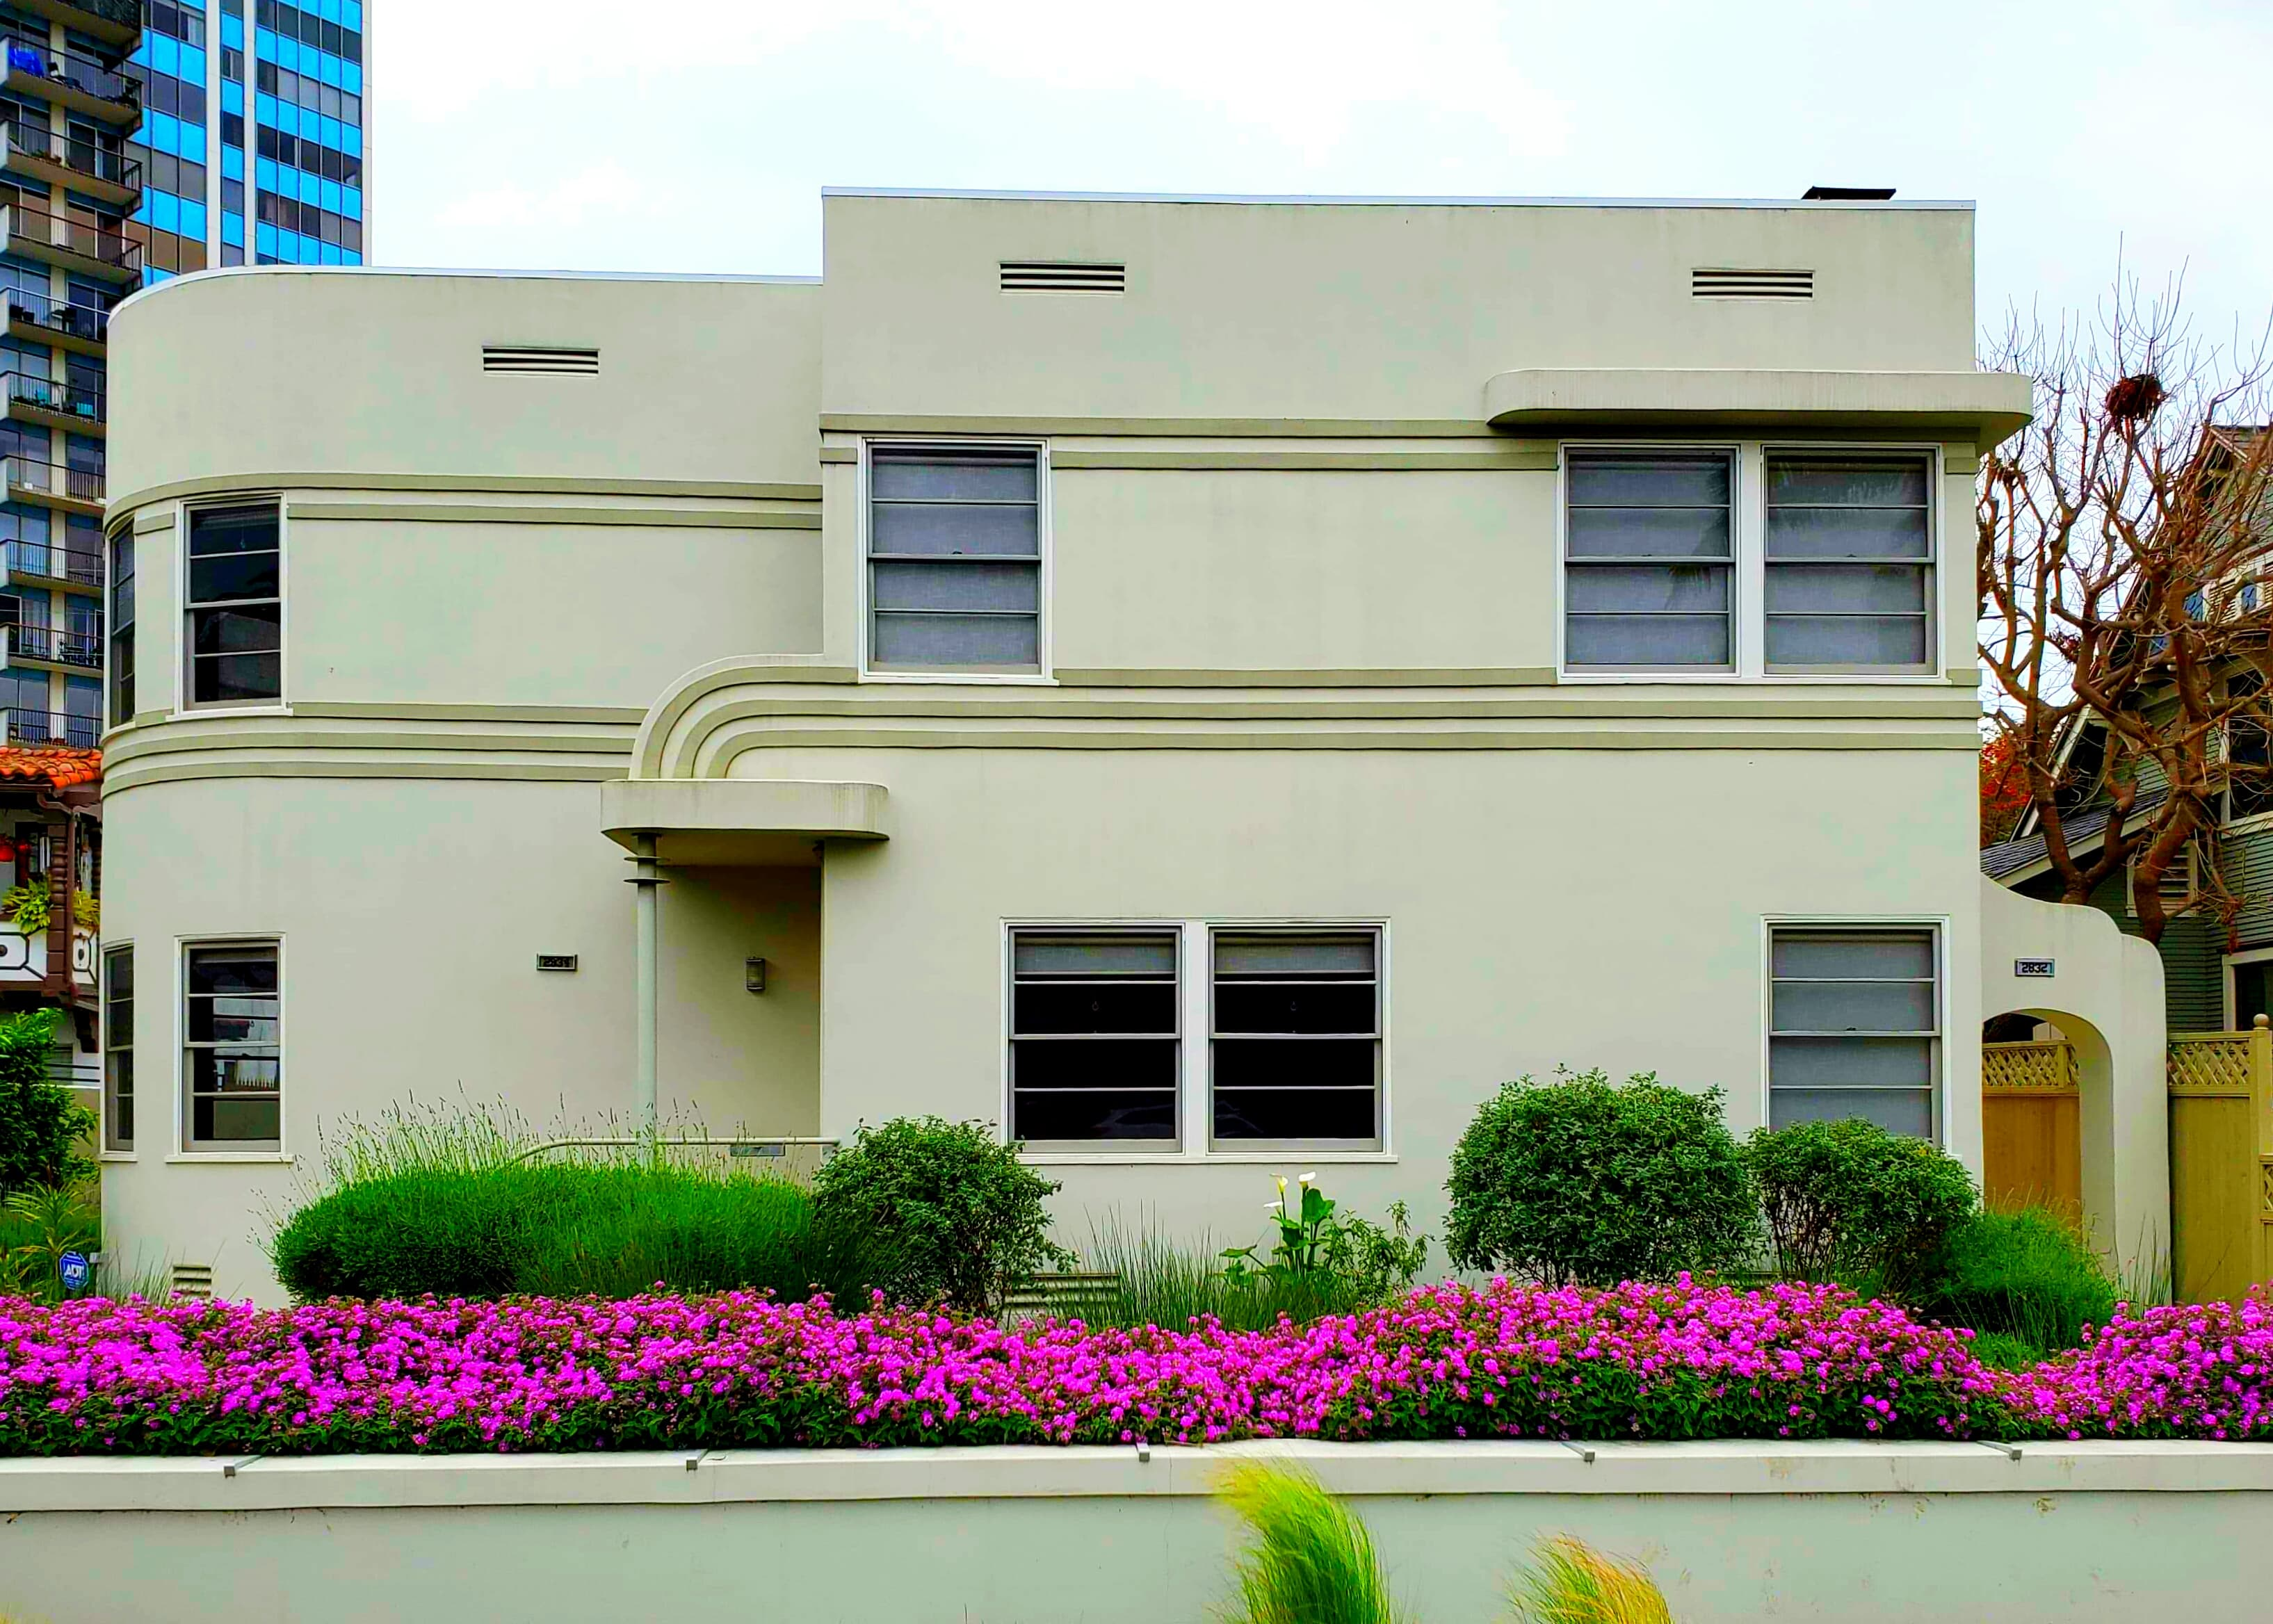 Apartments - SM - 2832 1st St Long Beach CA 90803